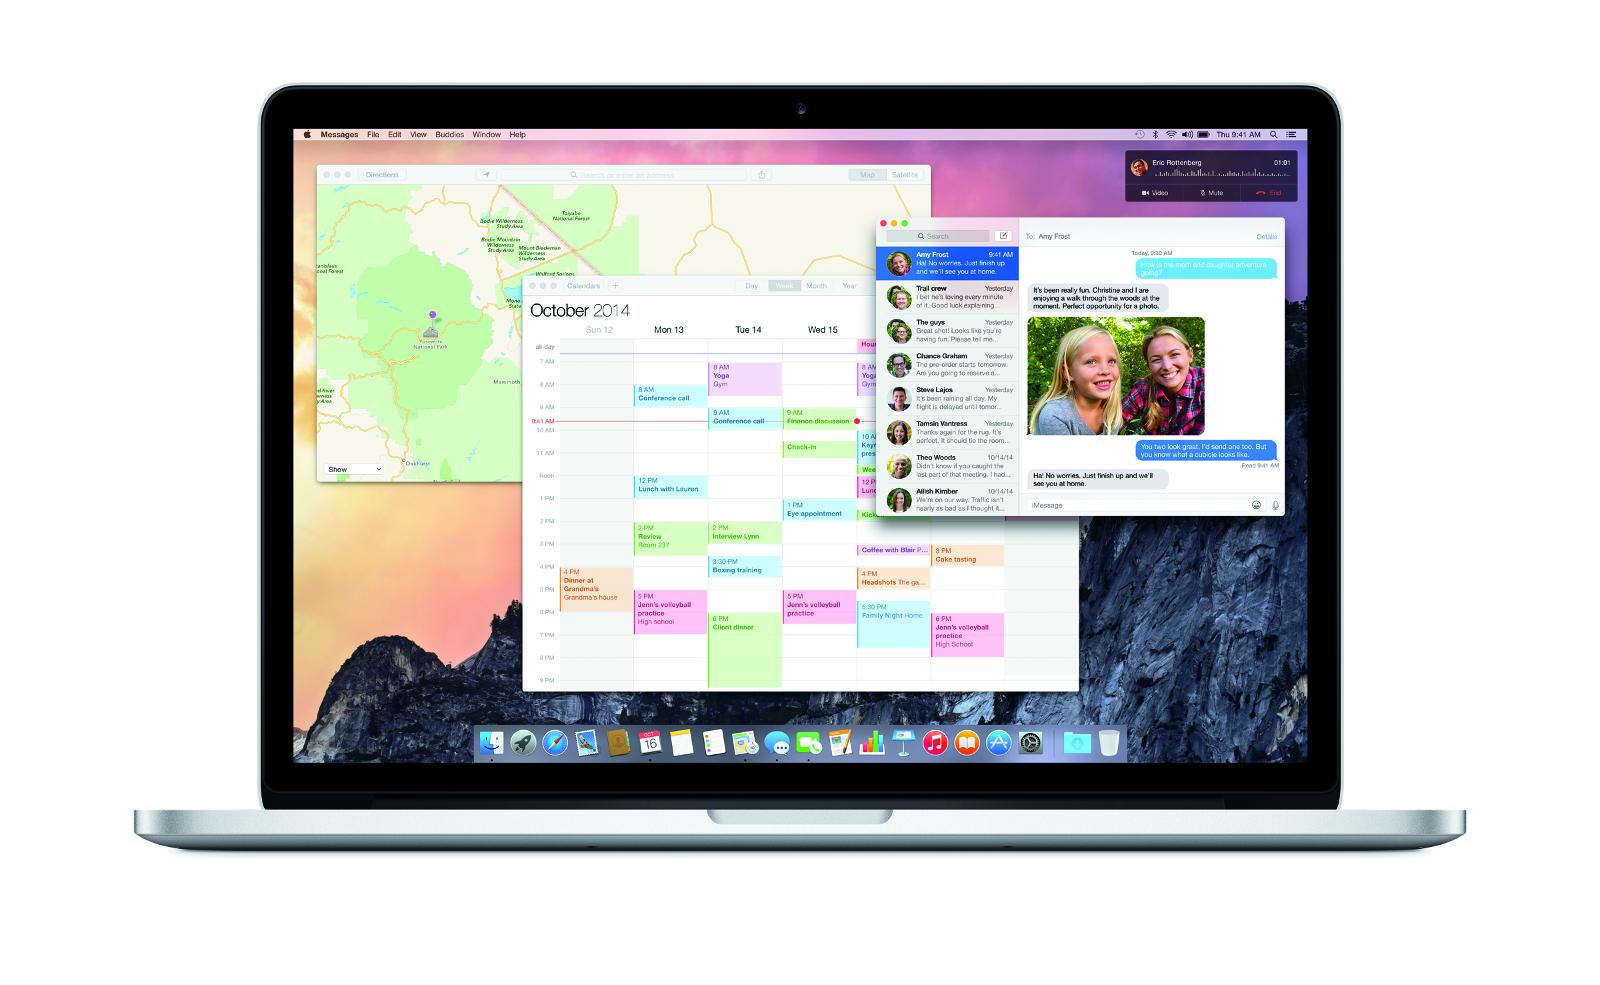 How to Install OS X Yosemite Hackintosh on PC via UniBeast